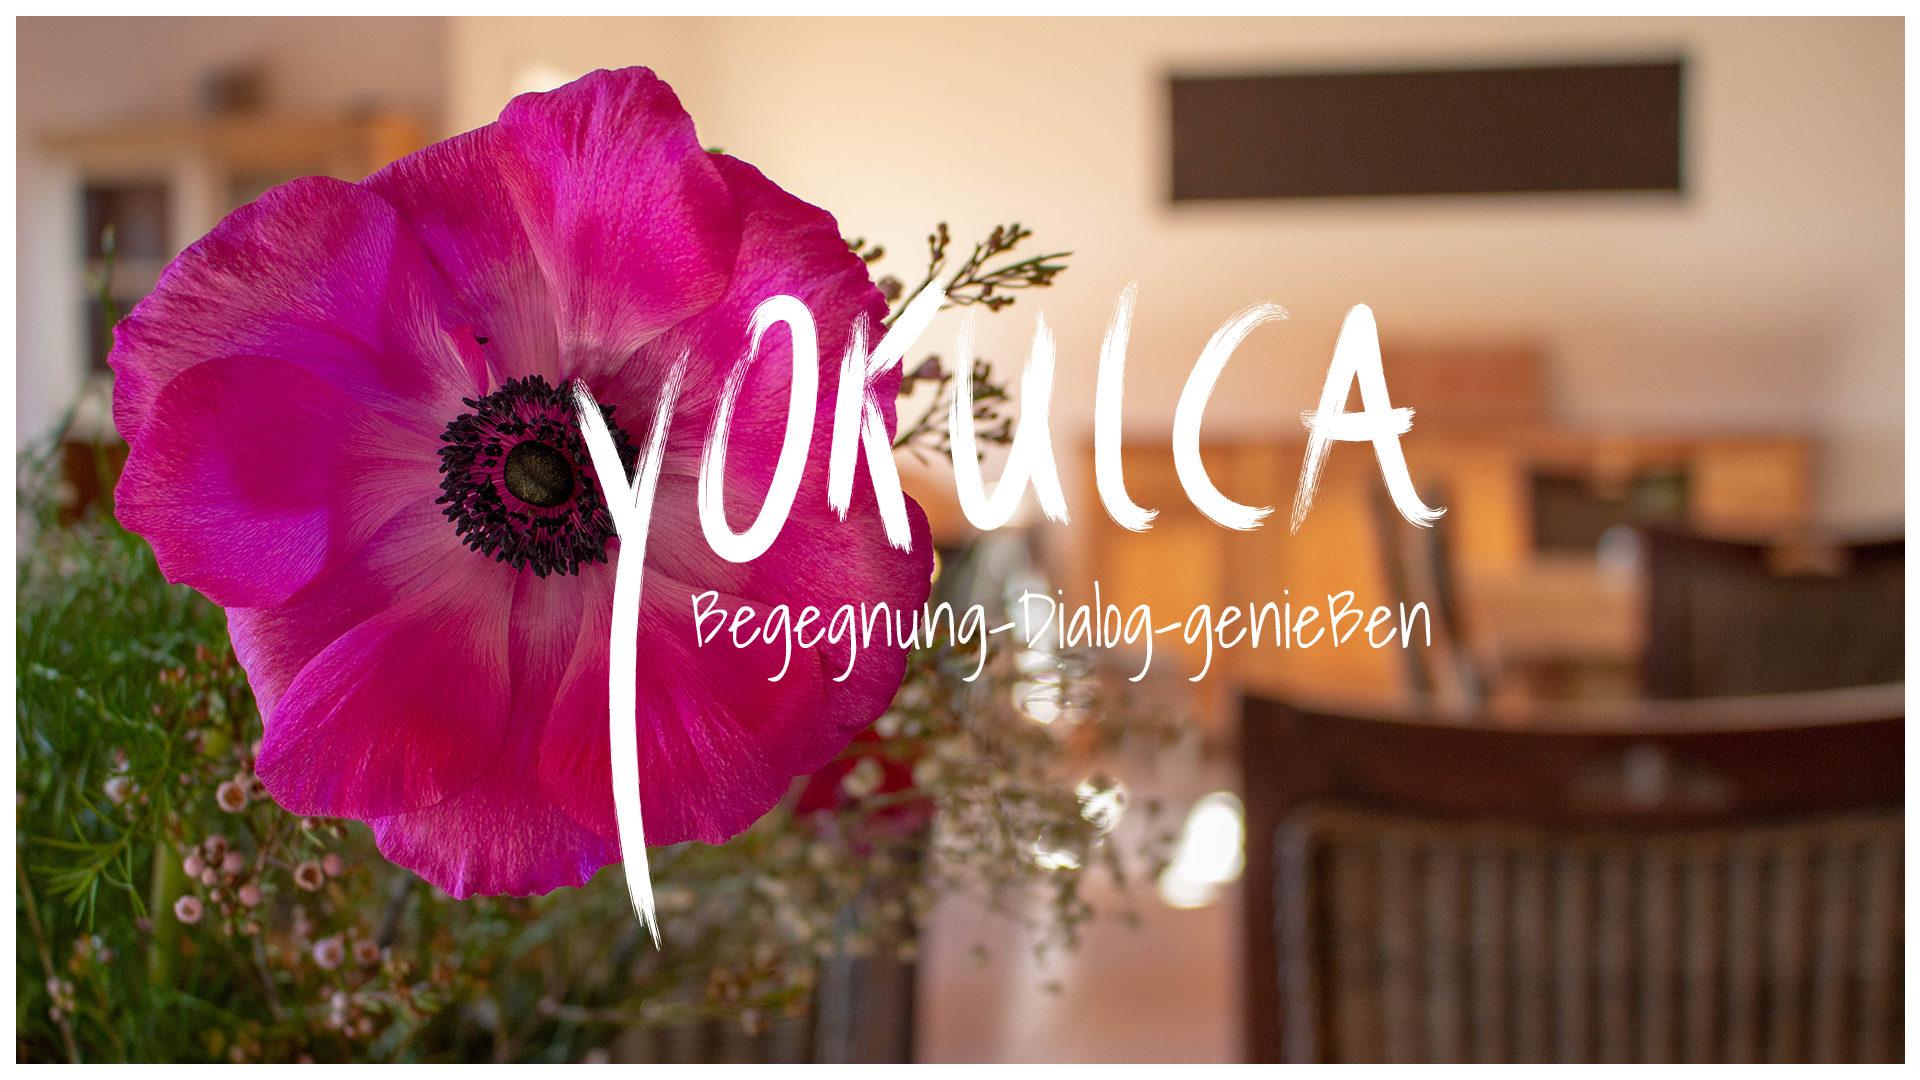 Yokulca